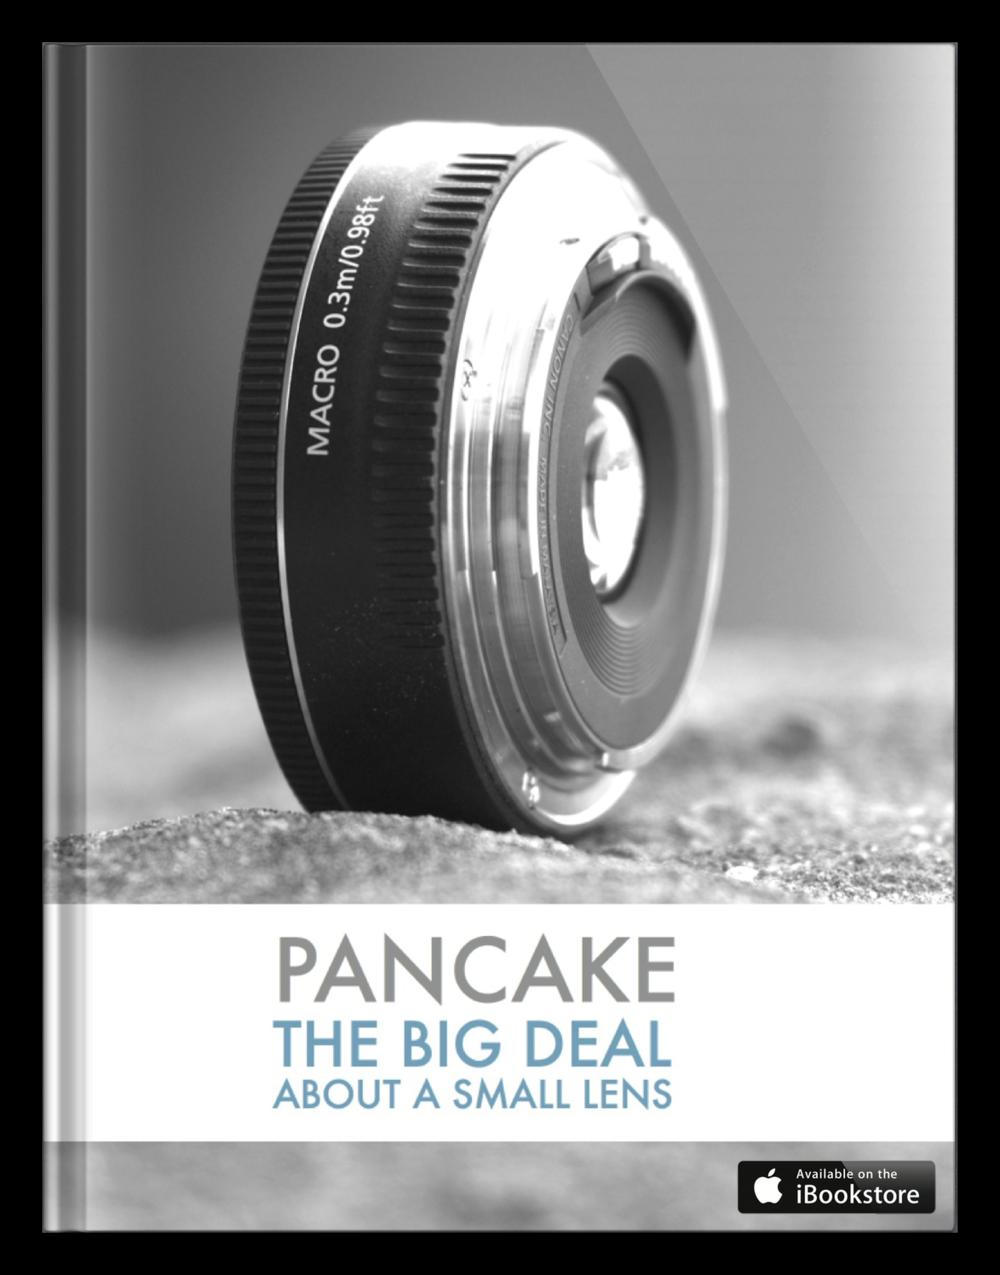 Pancake - Book Cover - iBooks